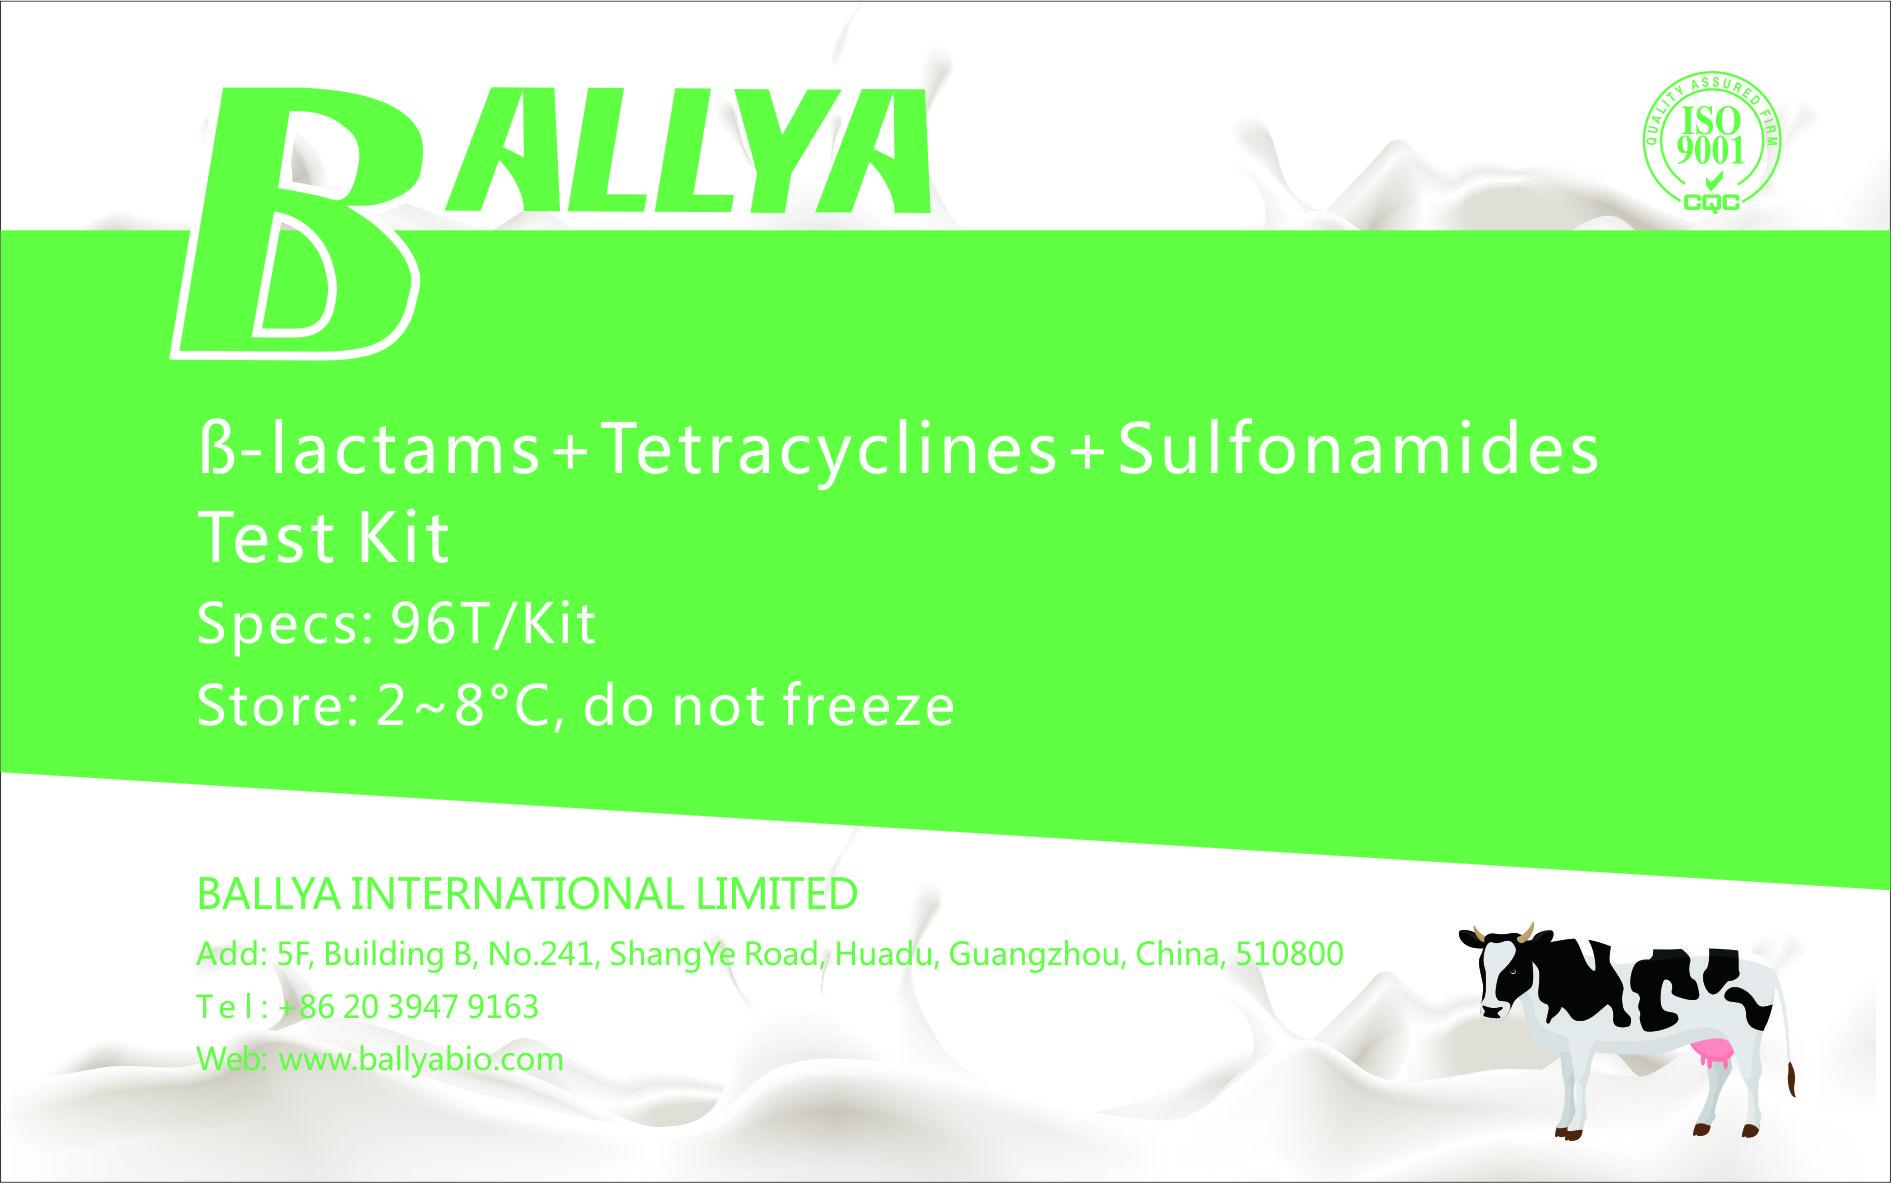 ß-lactams-Tetracyclines-Sulfonamides